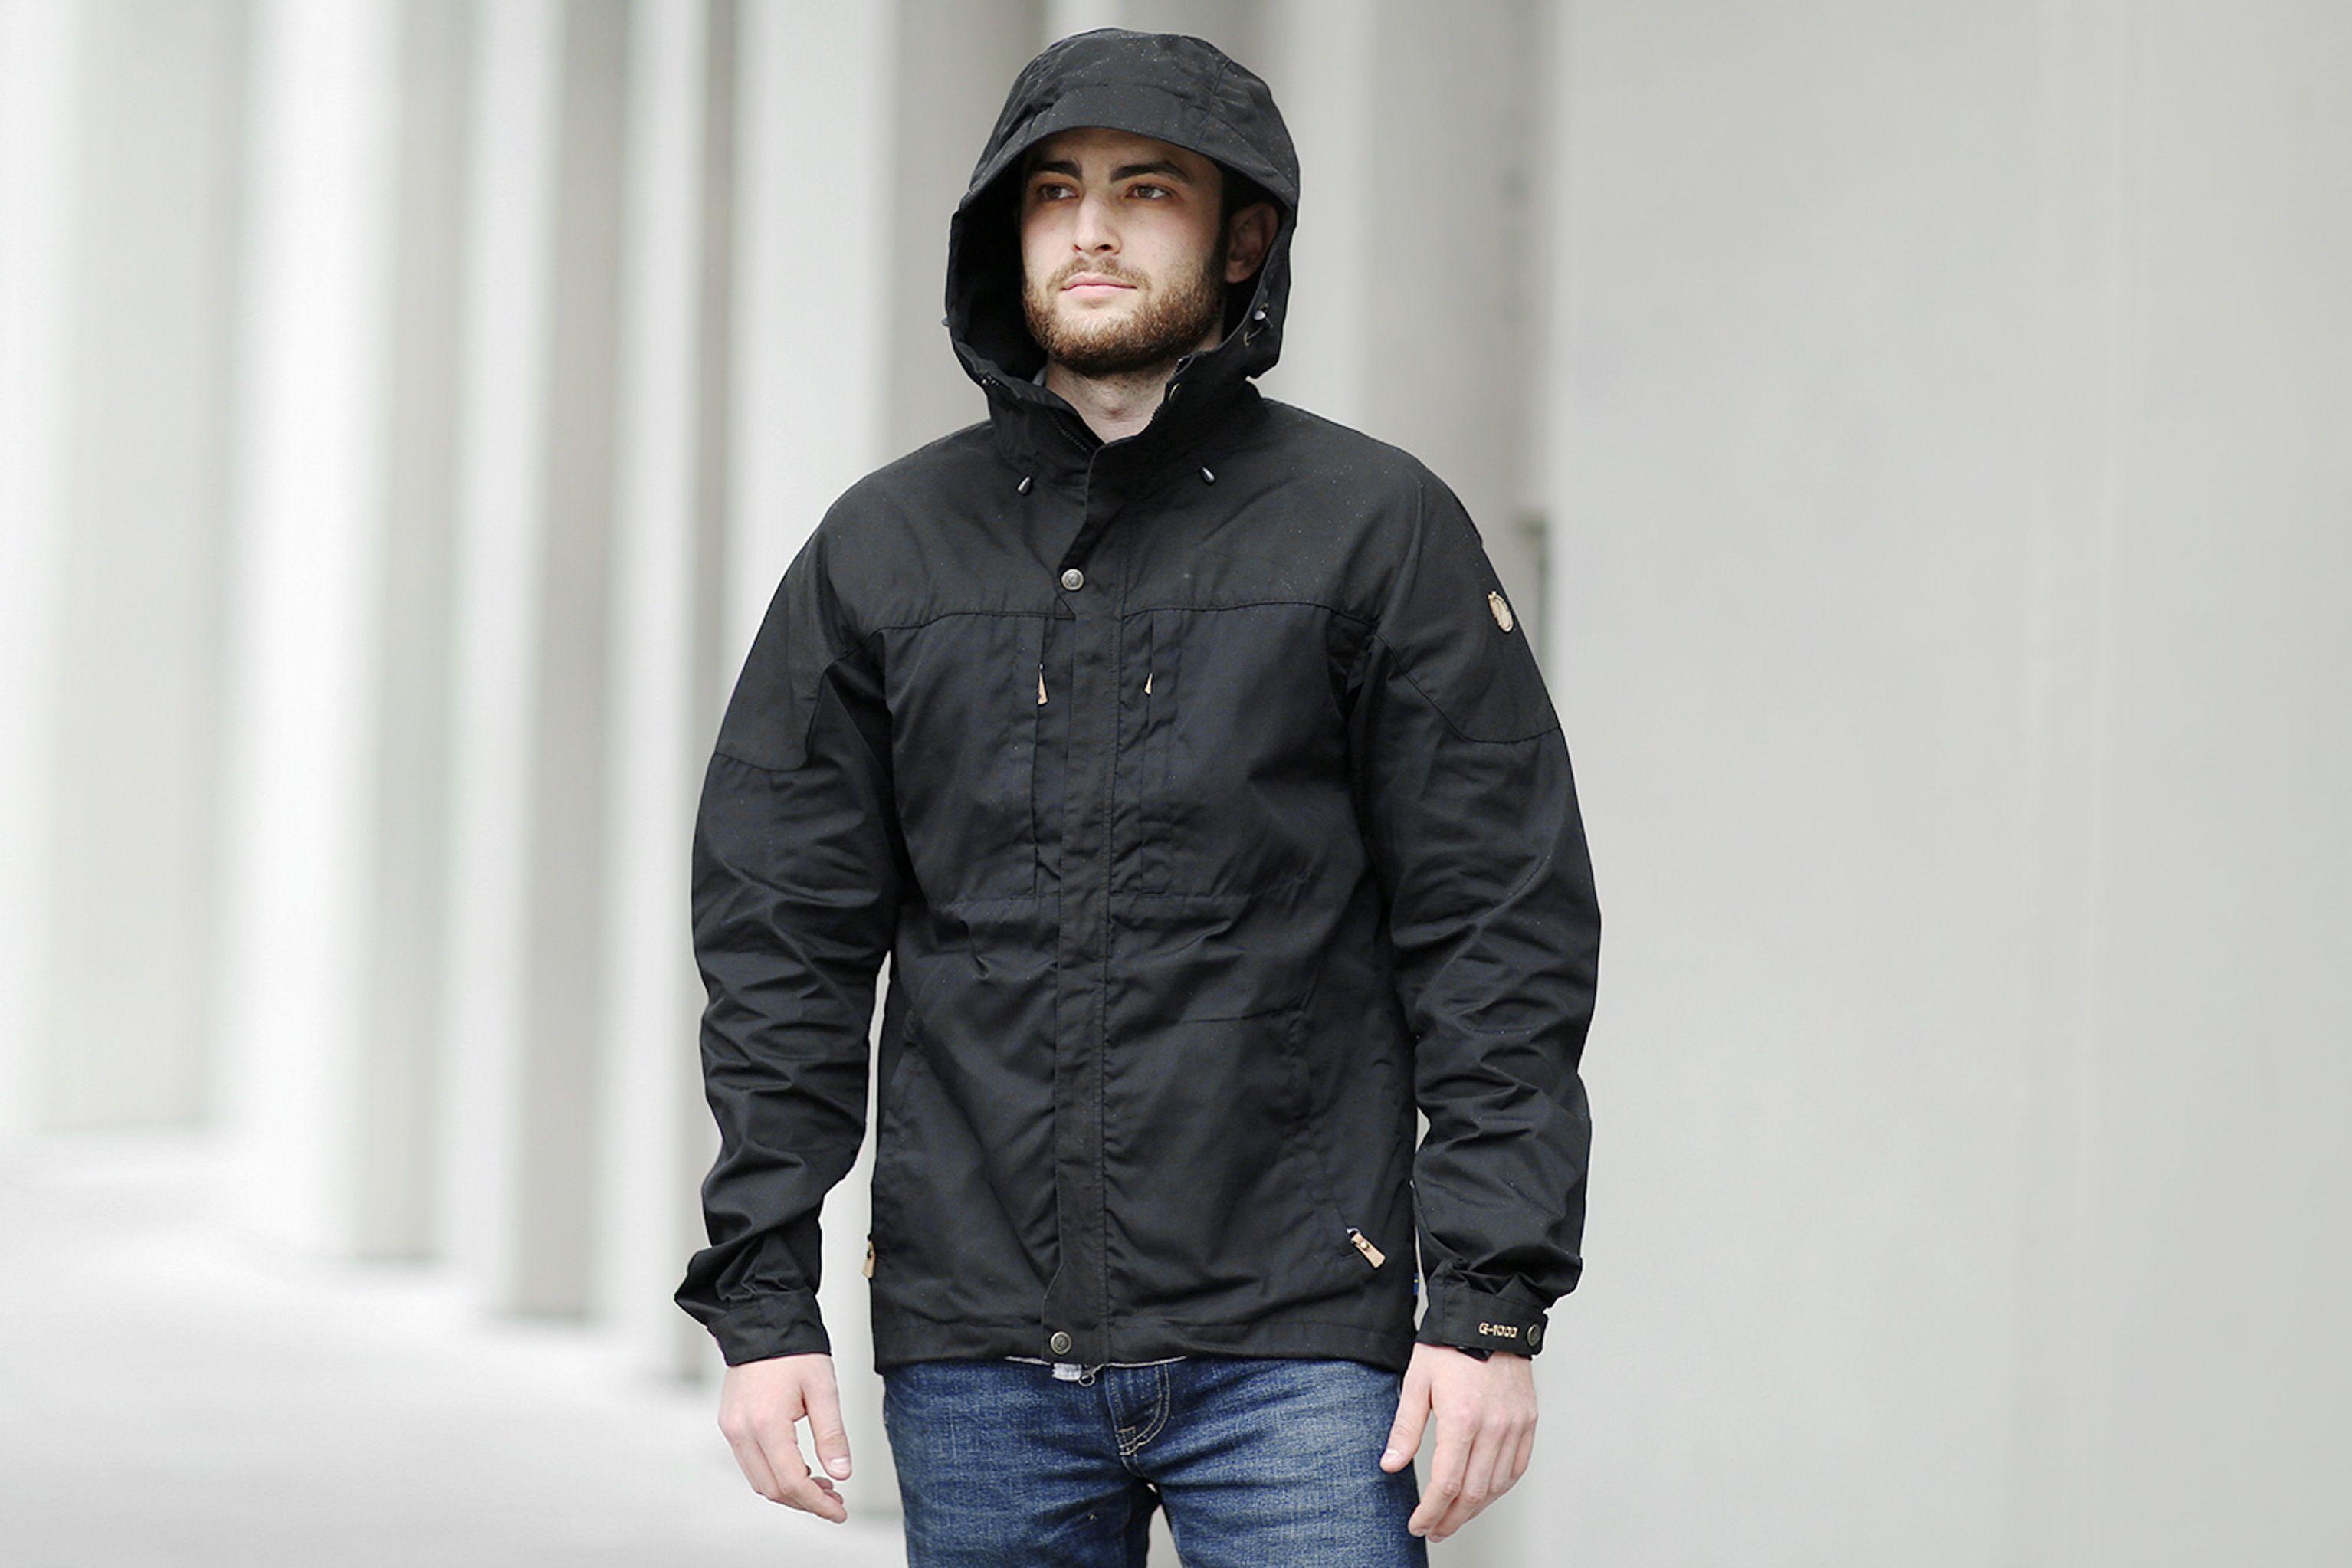 Fjällräven Skogsö Jacket | Jackets, Jacket price, Bomber jacket